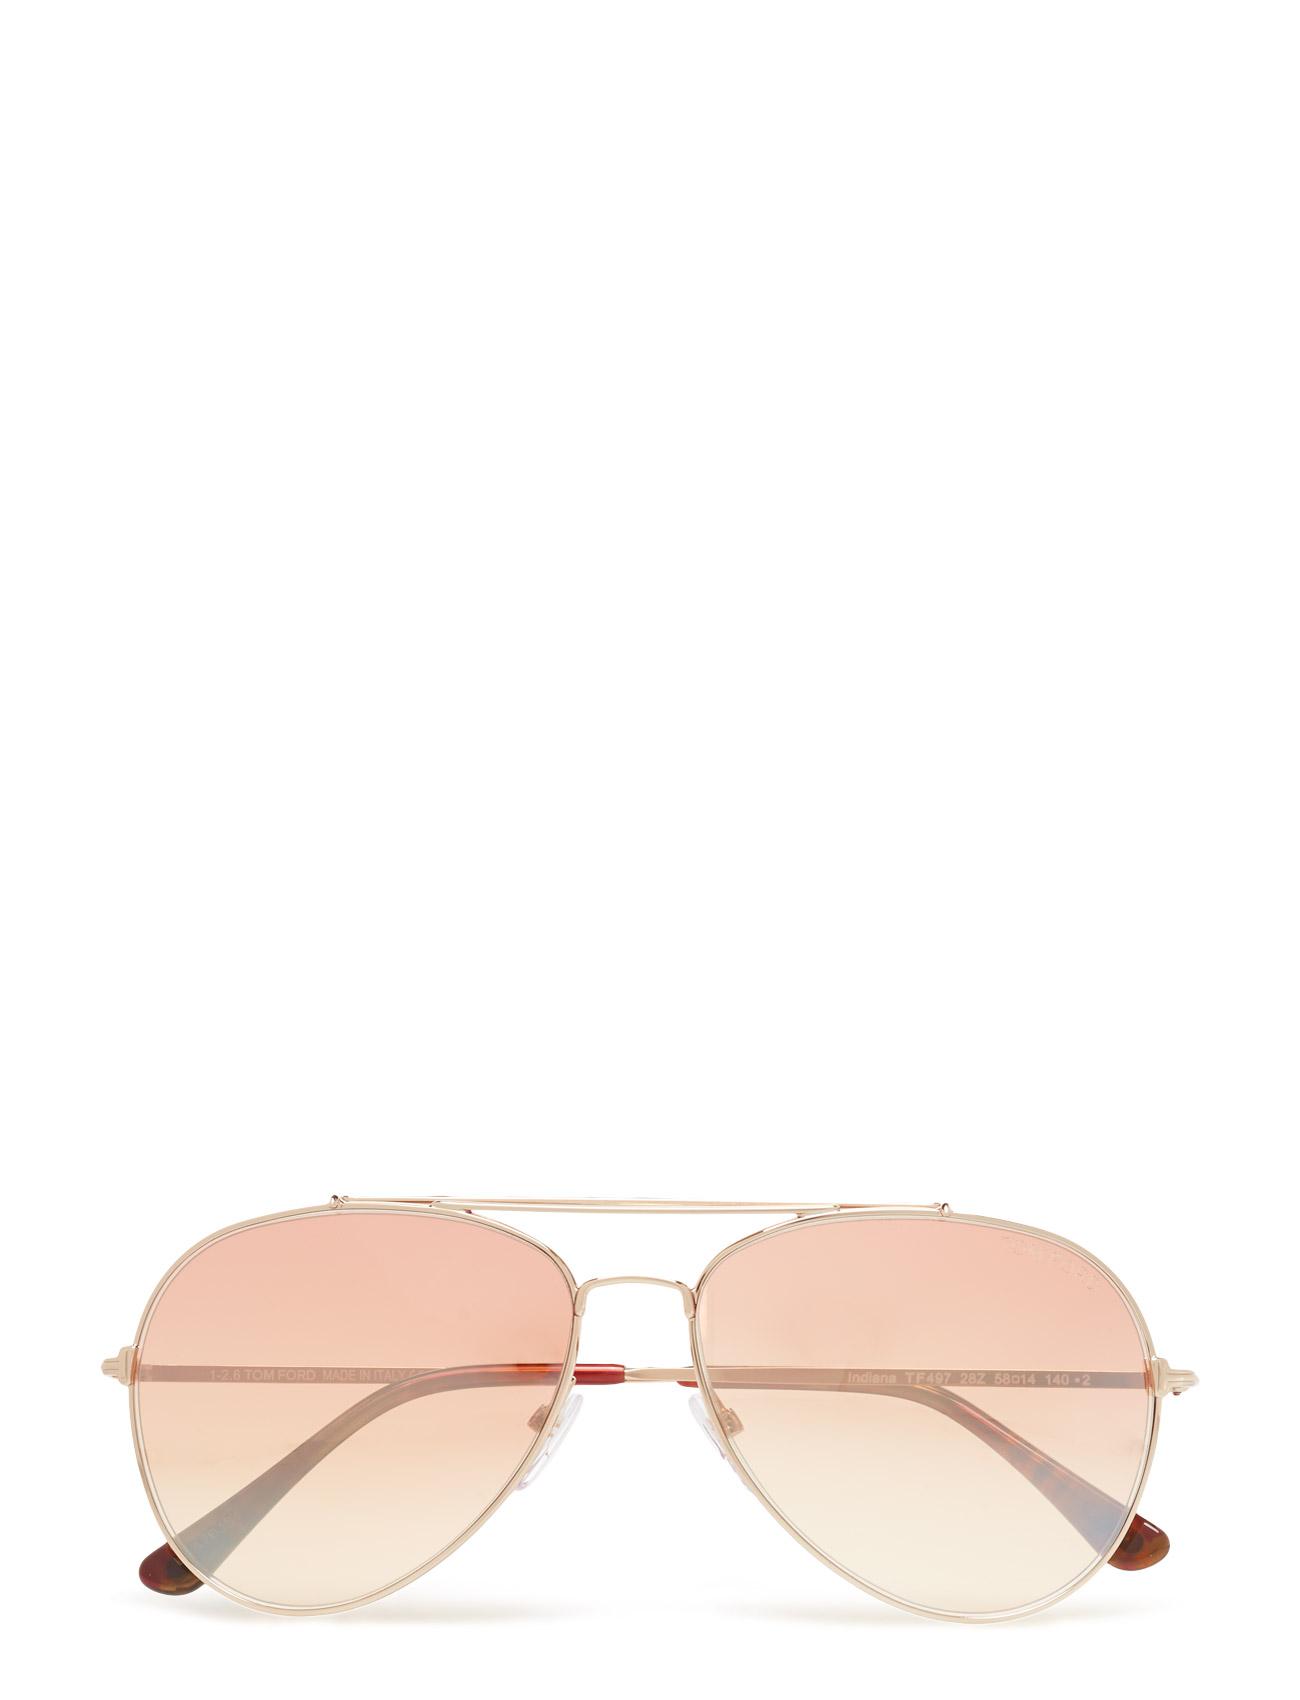 Tom Ford Indiana Tom Ford Sunglasses Solbriller til Damer i